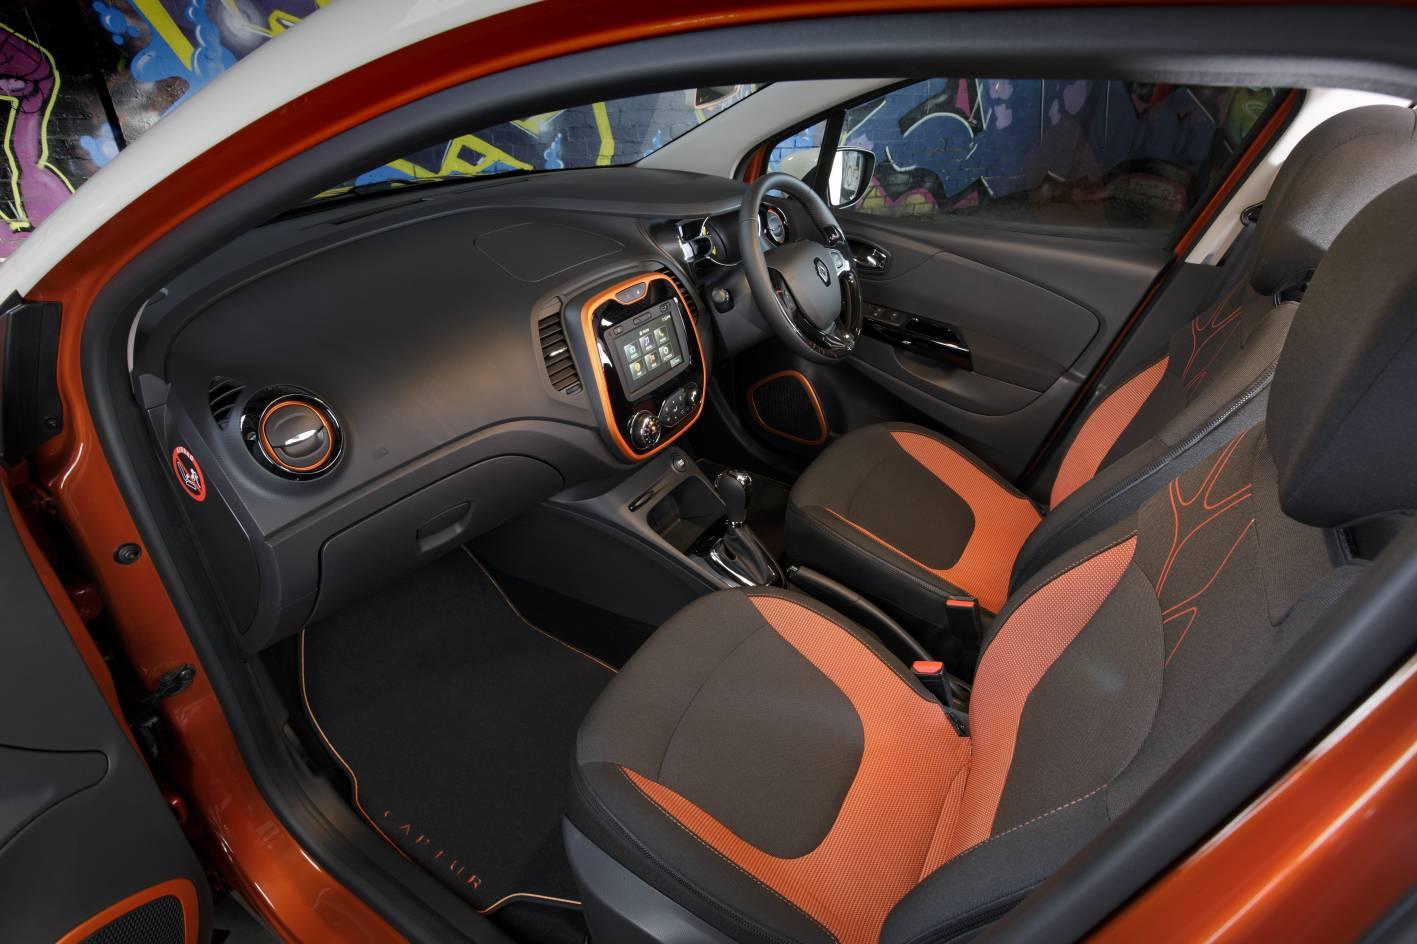 Renault captur now on sale in australia from 22 990 for Interior renault captur